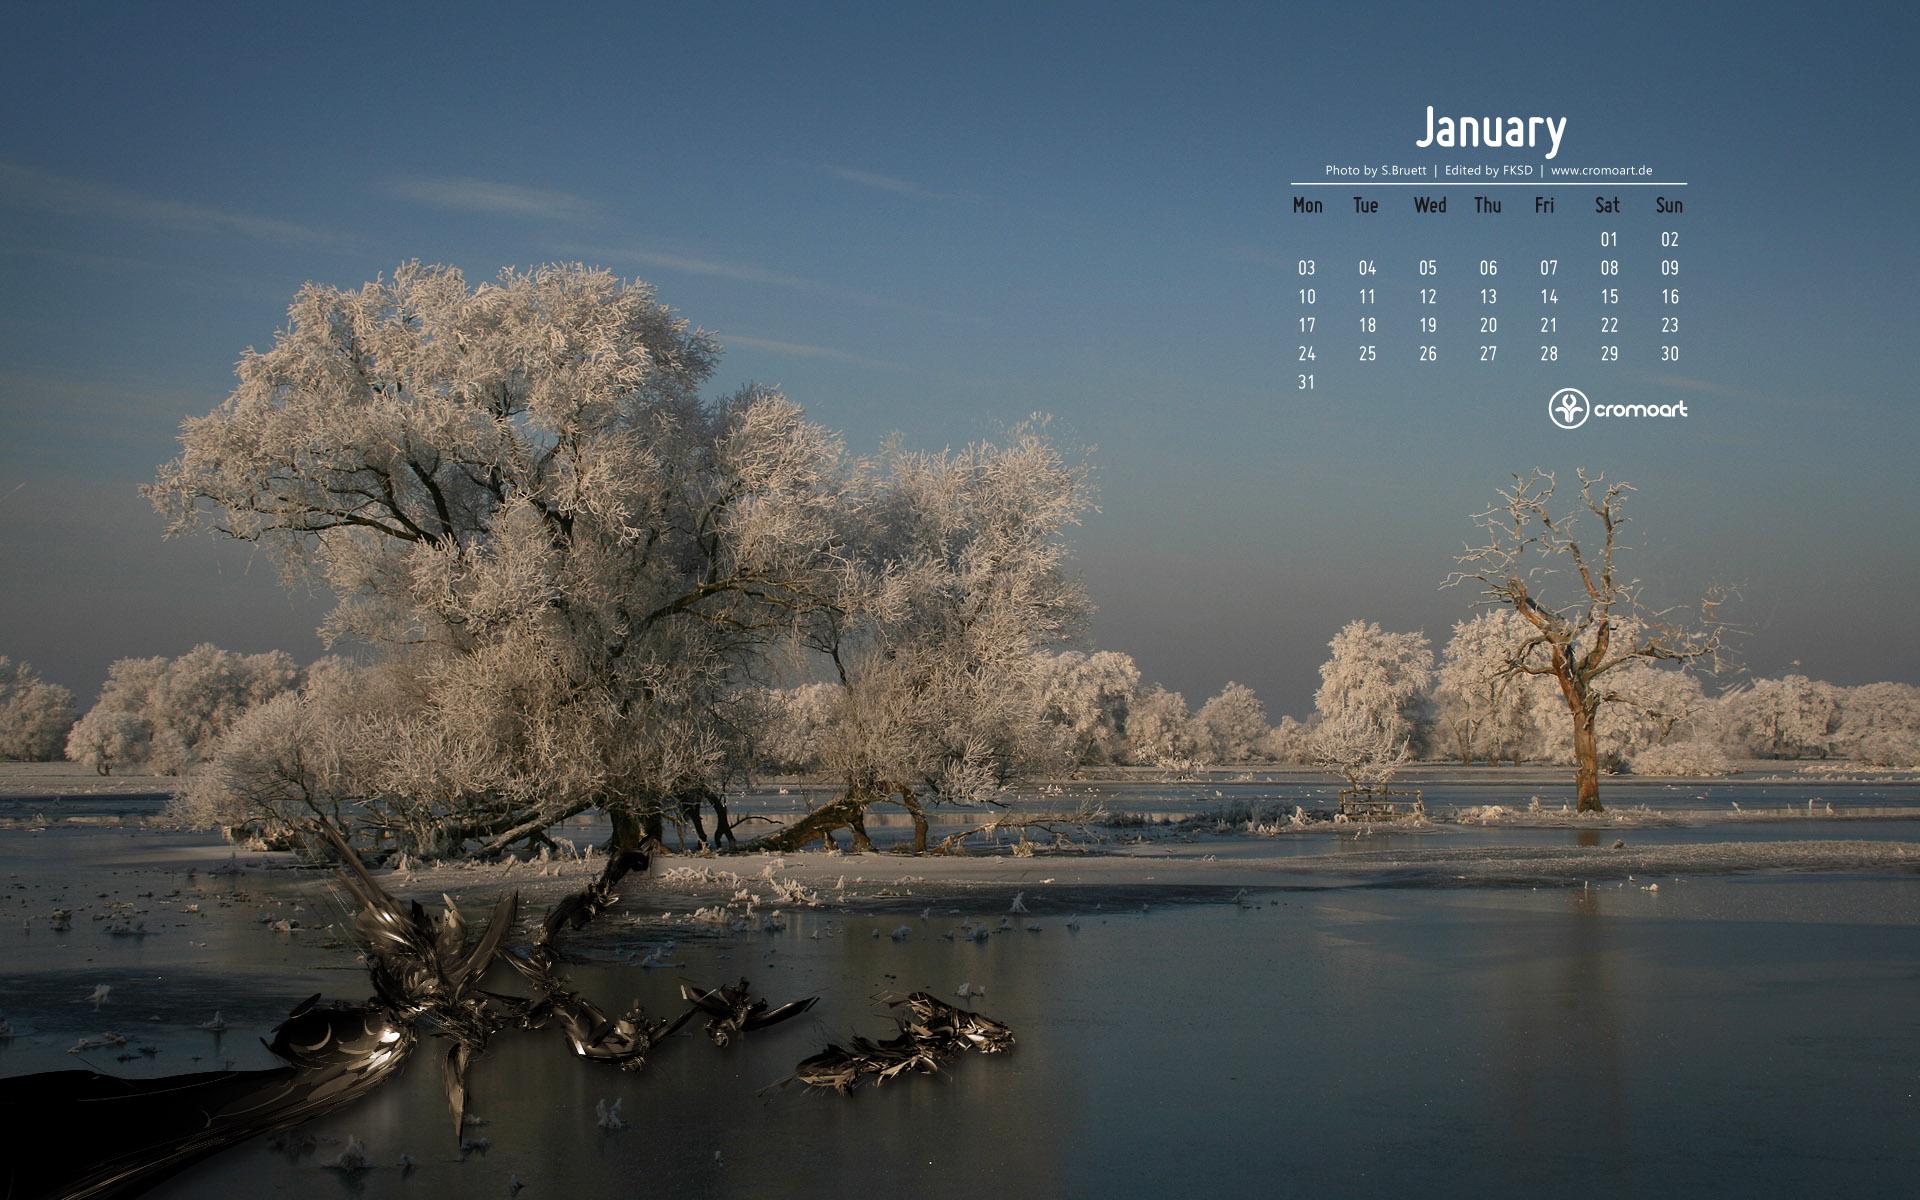 january 2011 desktop calendar wallpaper 277378